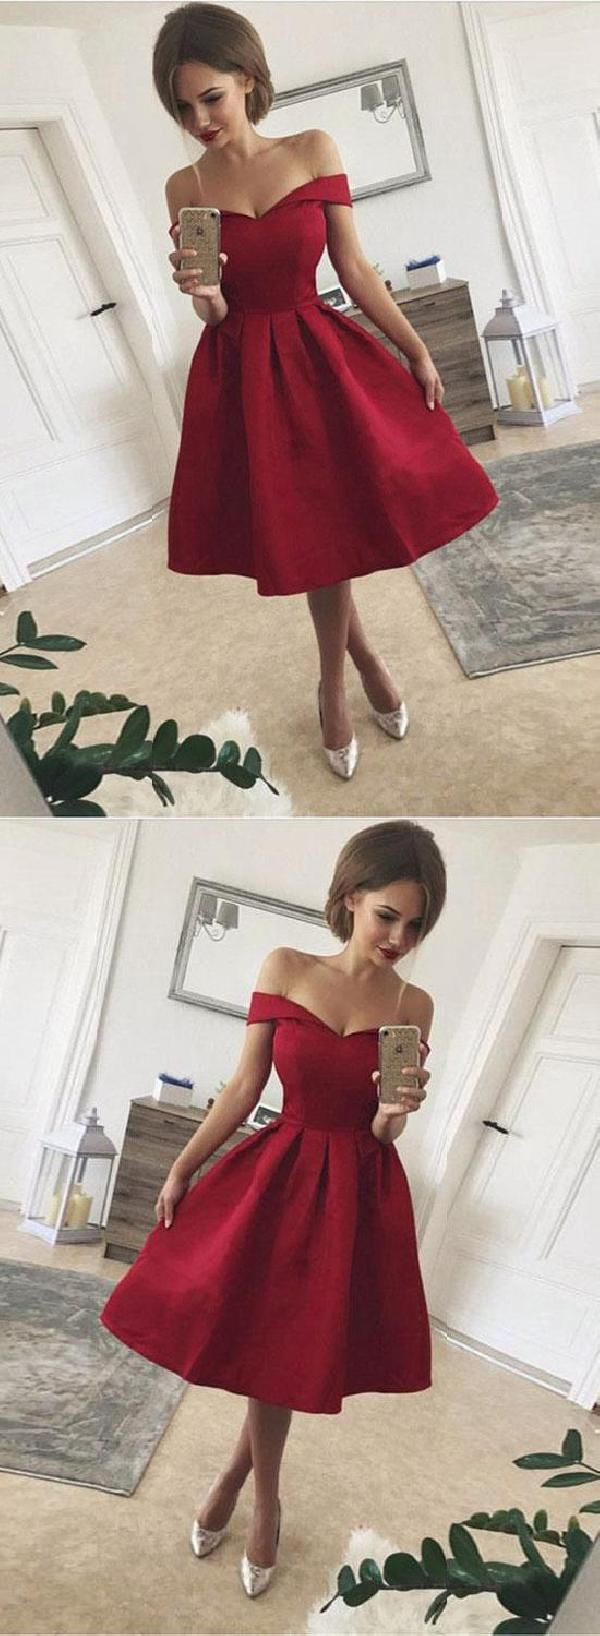 Customized admirable prom dress aline short homecoming dress cute